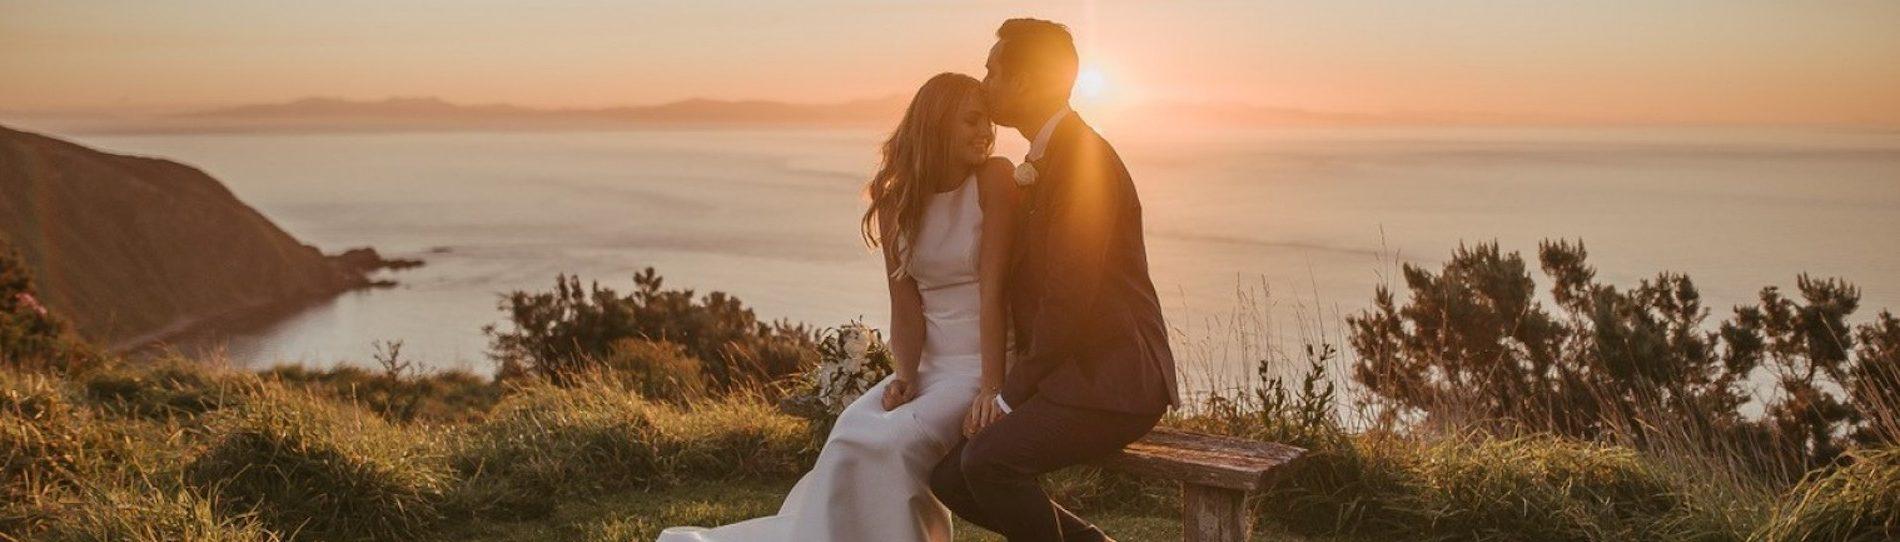 wedding planning companies wellington